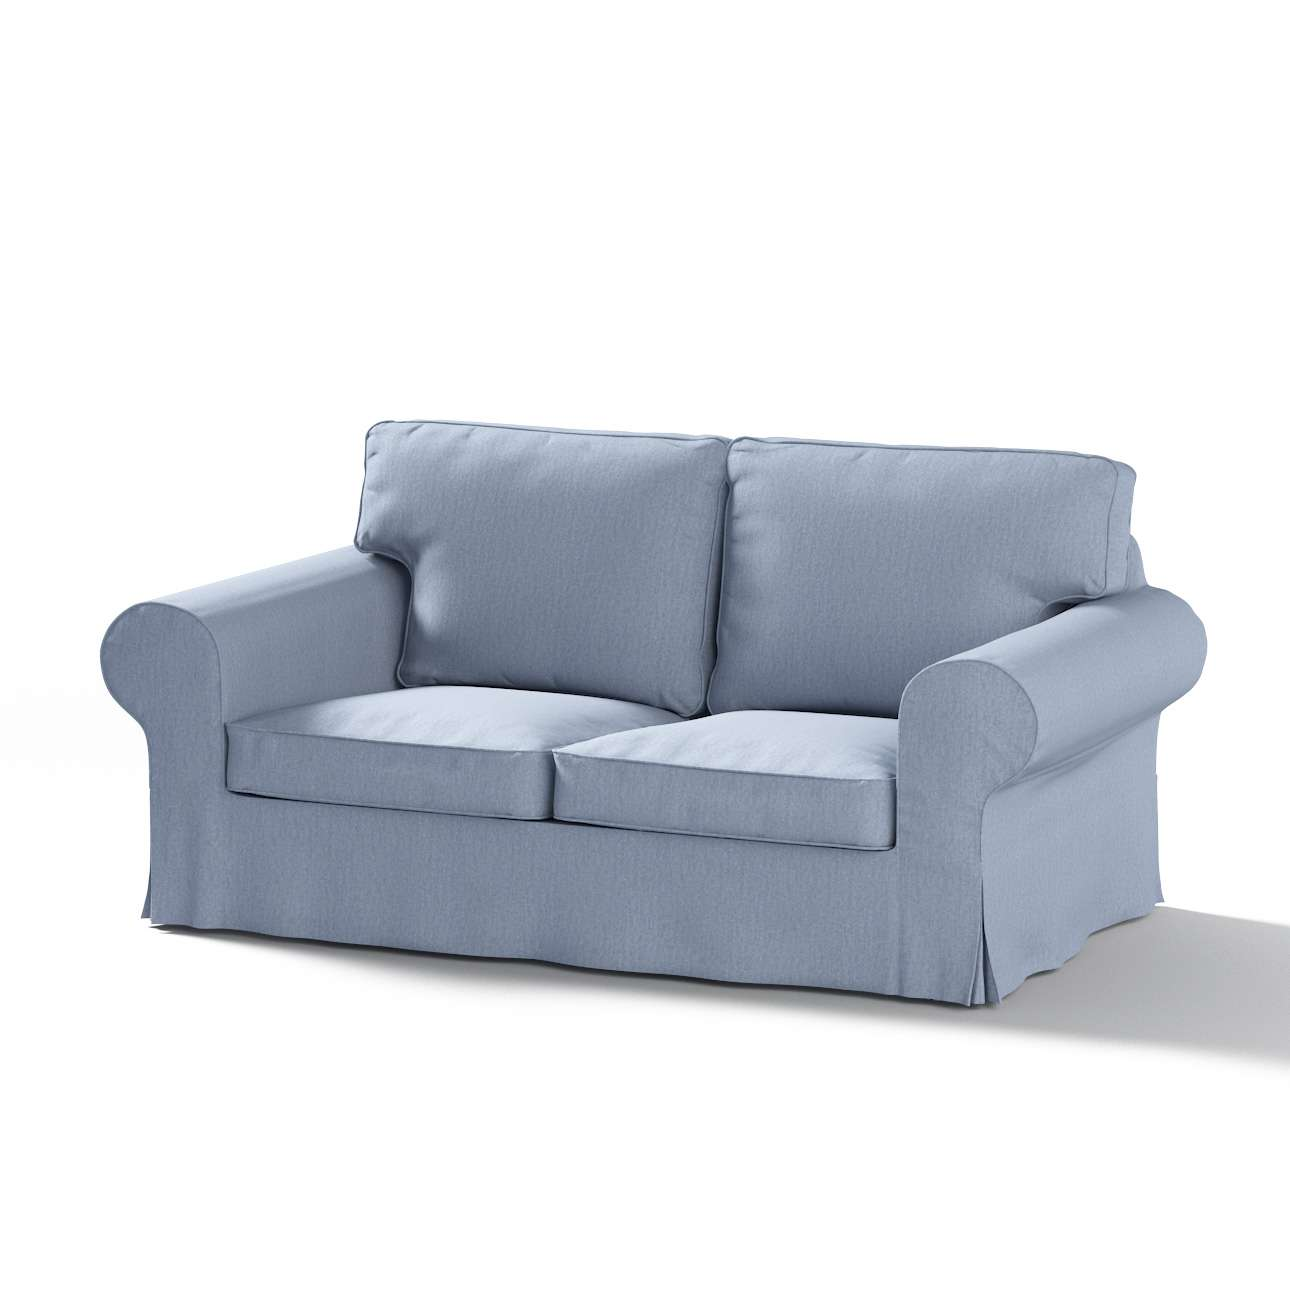 Ektorp 2 sæder sovesofa gammel model<br/>Bredde ca 195cm Betræk uden sofa fra kollektionen Chenille, Stof: 702-13